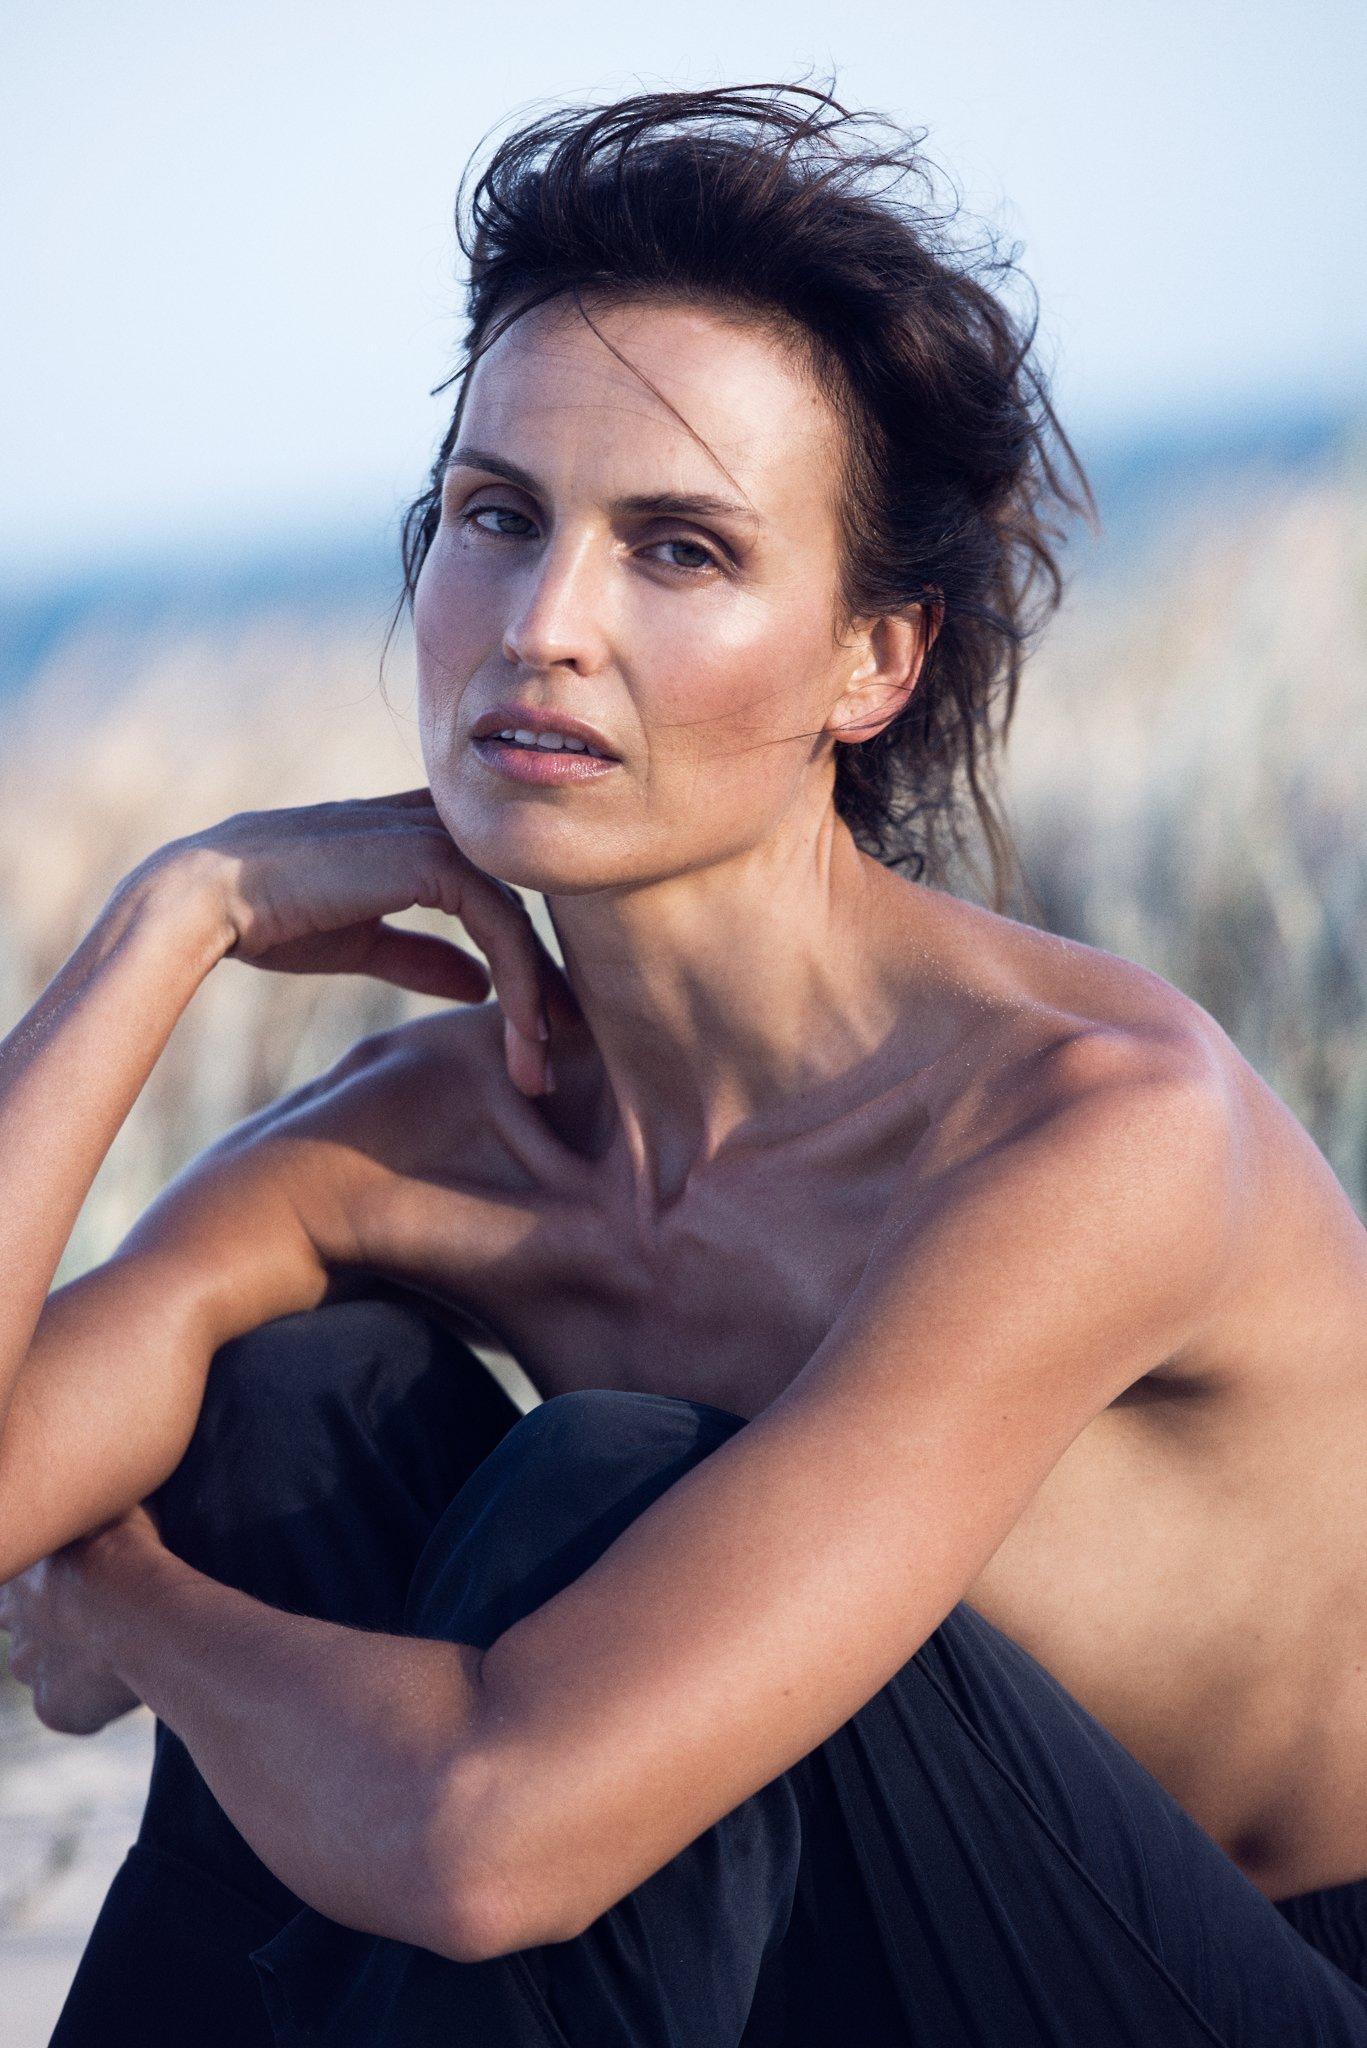 Abigail - Abigail O'Neill, Photographs: Dave Blake. Hair-Makeup: Nahid Kholghi; Location: Byron Bay, Australia